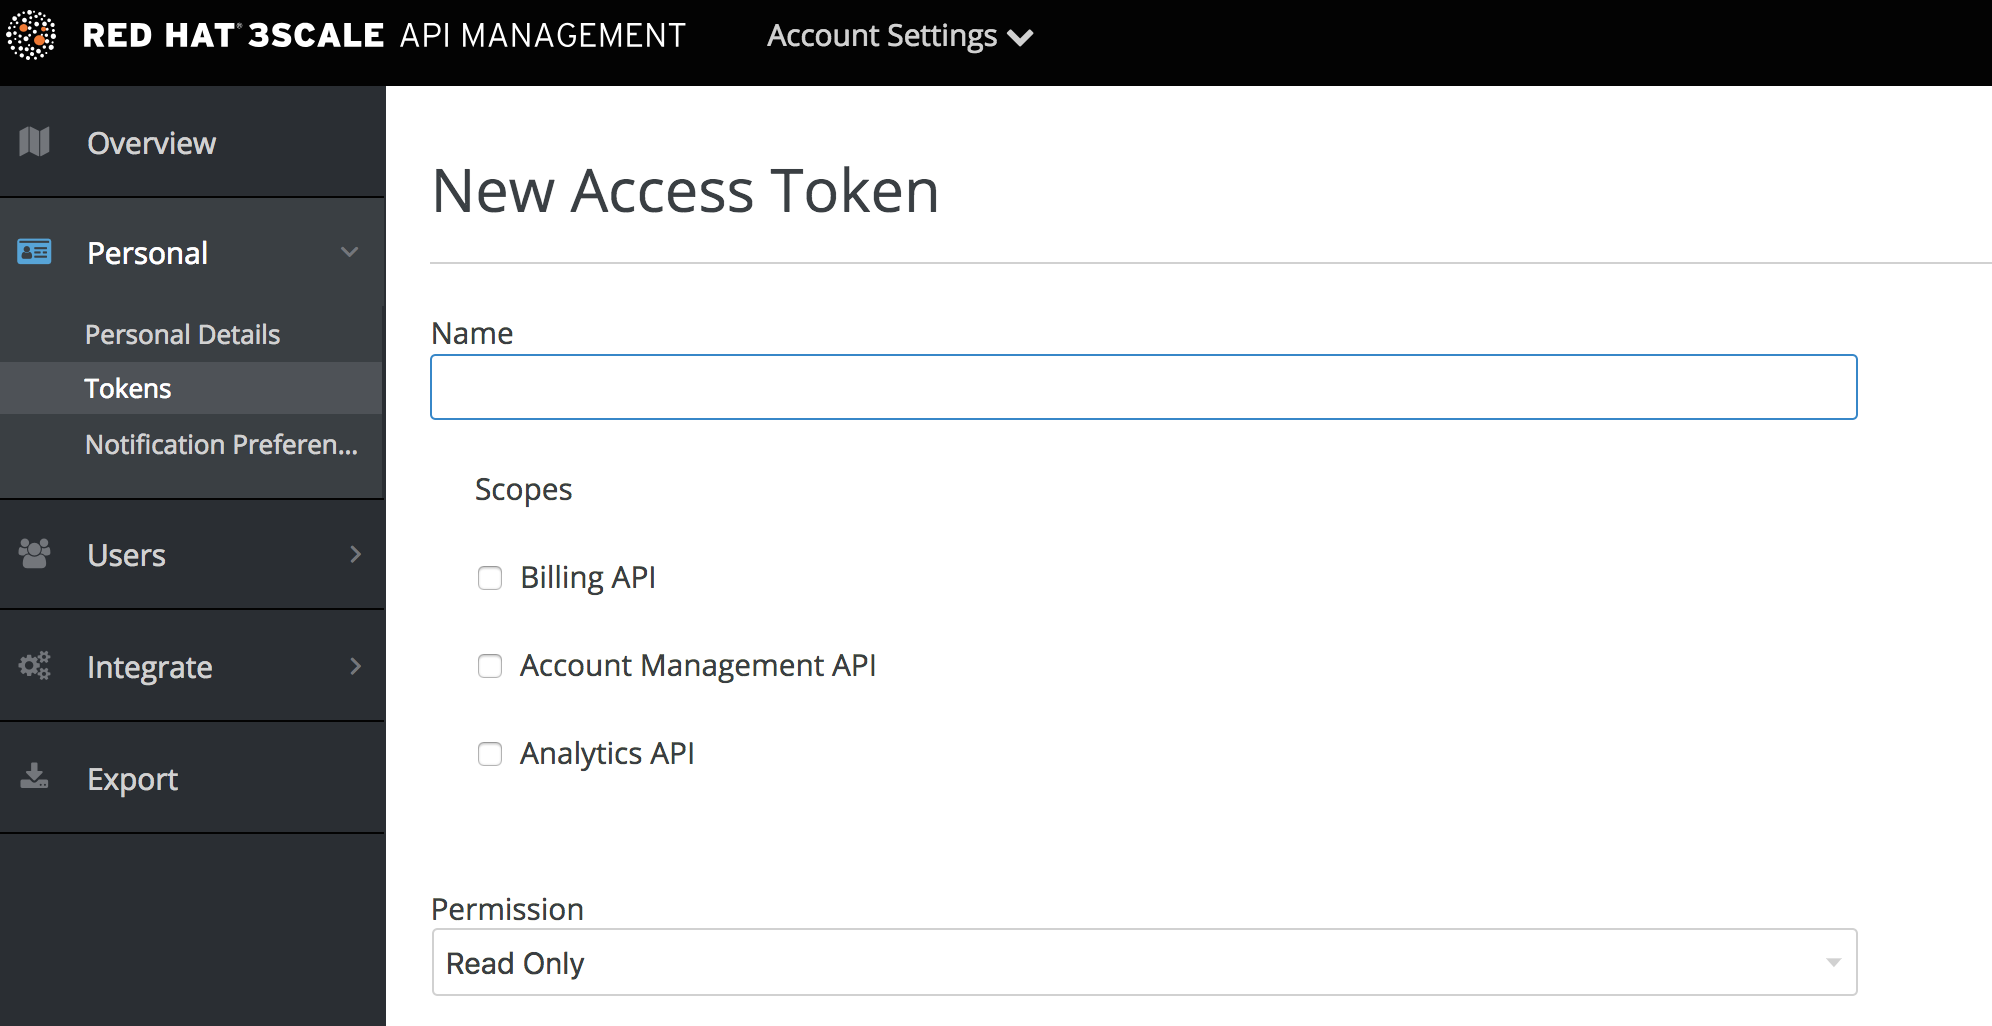 New access token